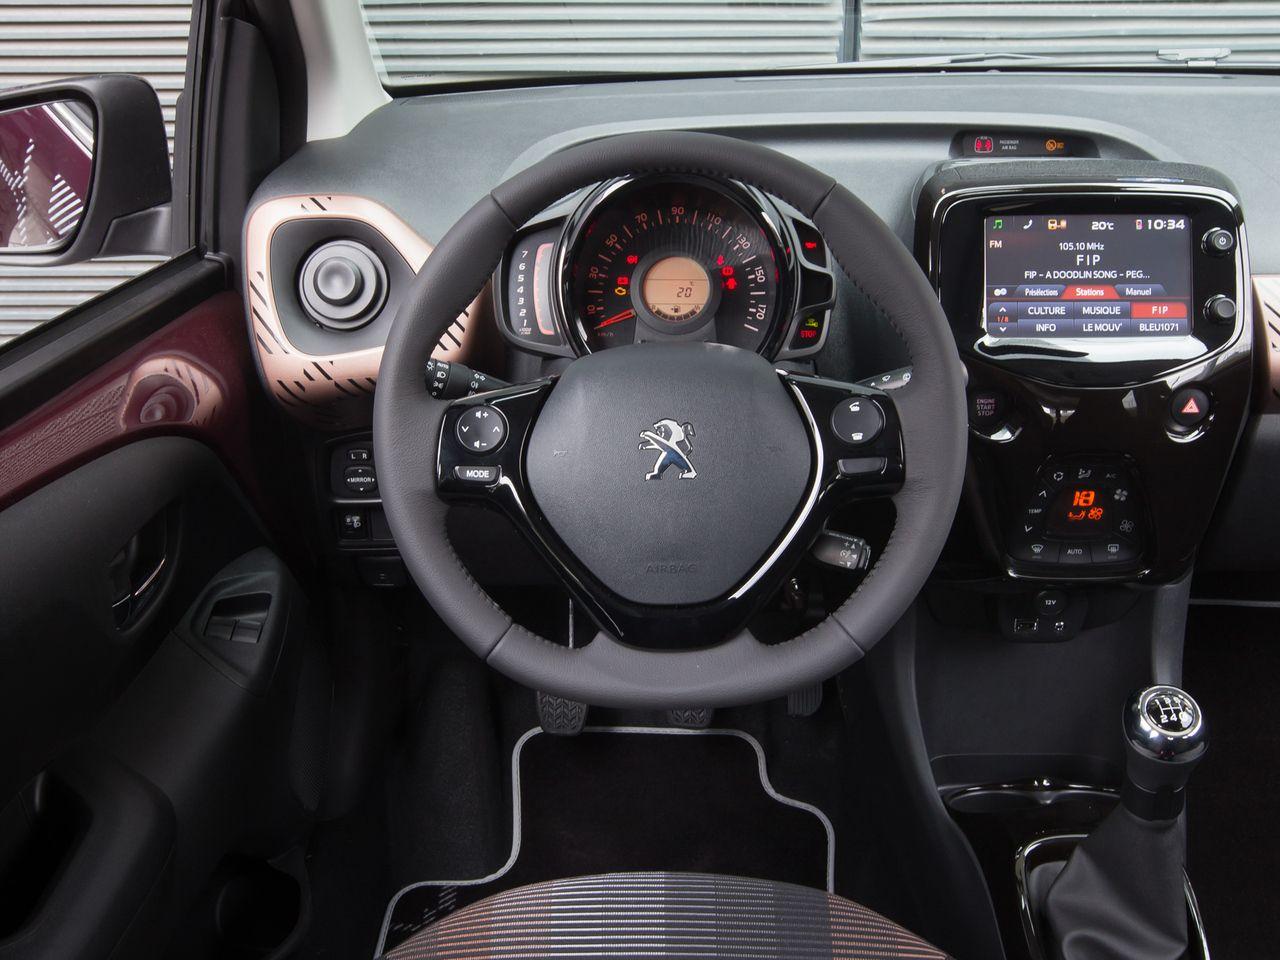 2014 Peugeot 108 Top